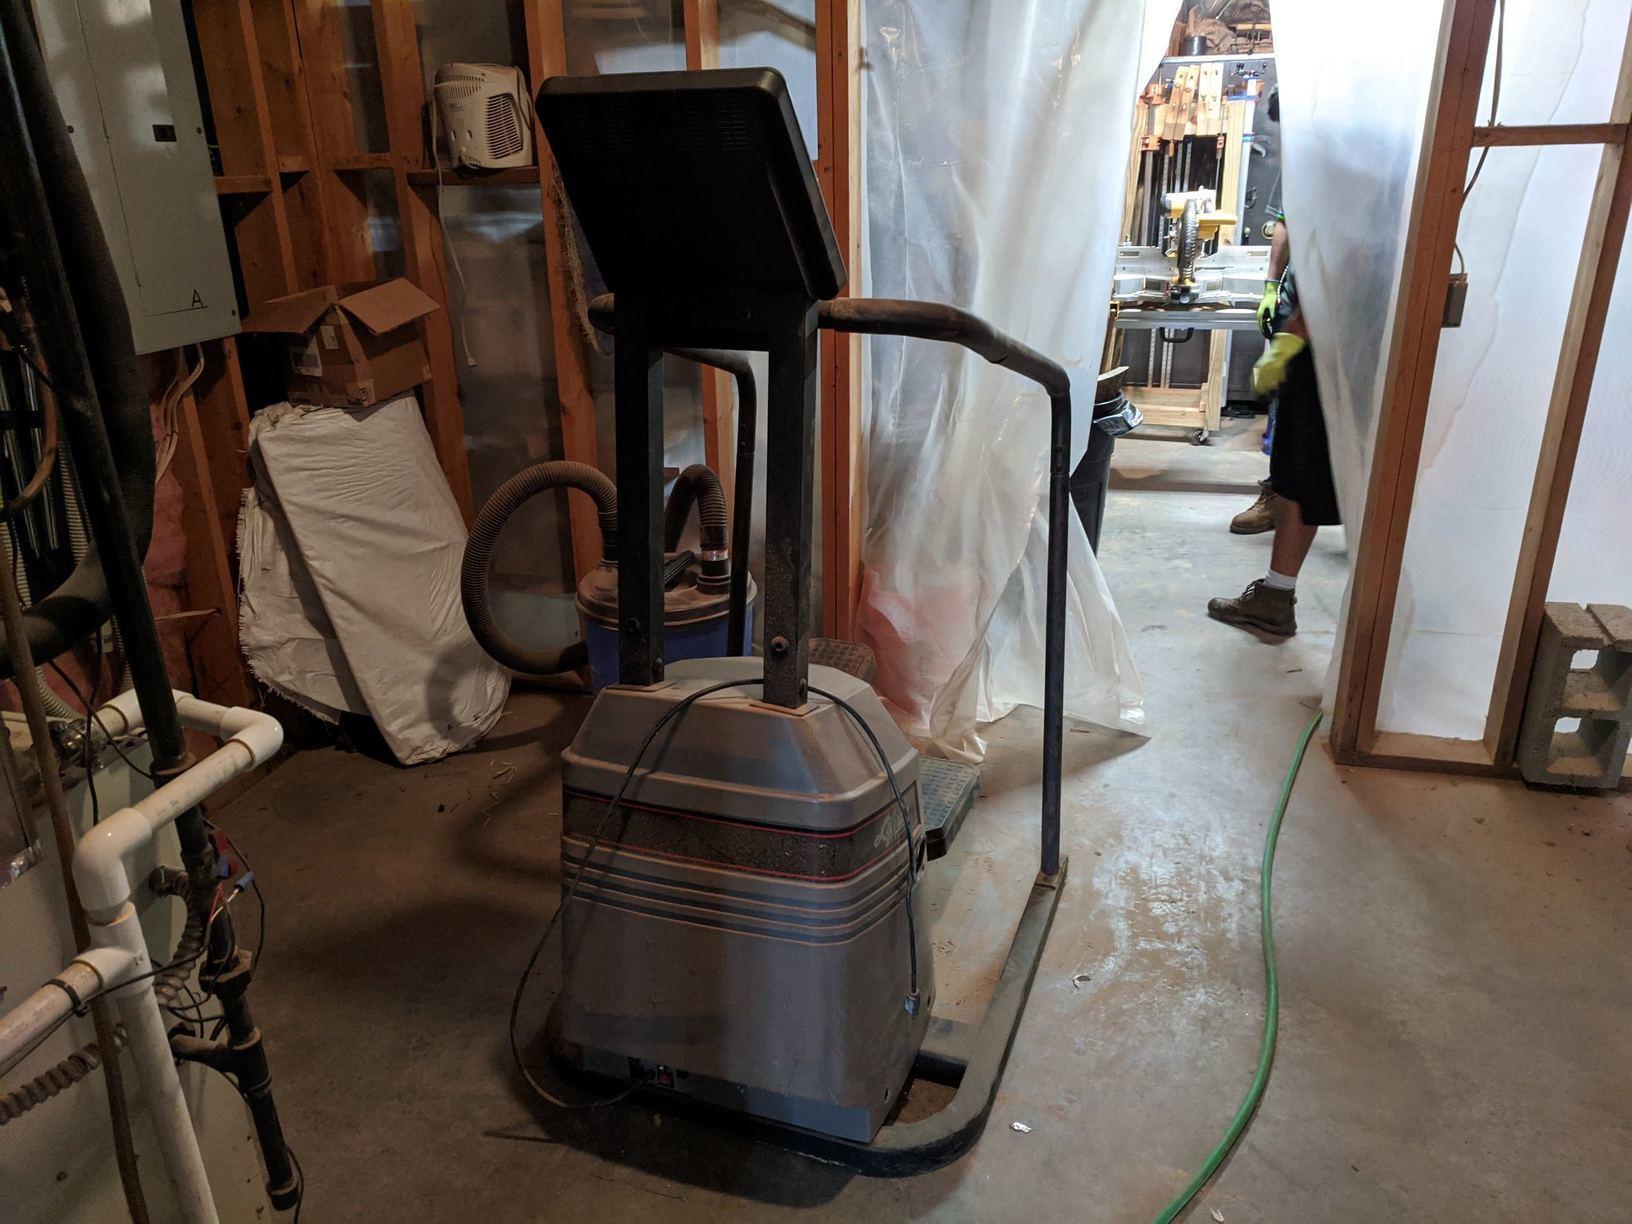 StairMaster Removal in Alpharetta, GA - Before Photo